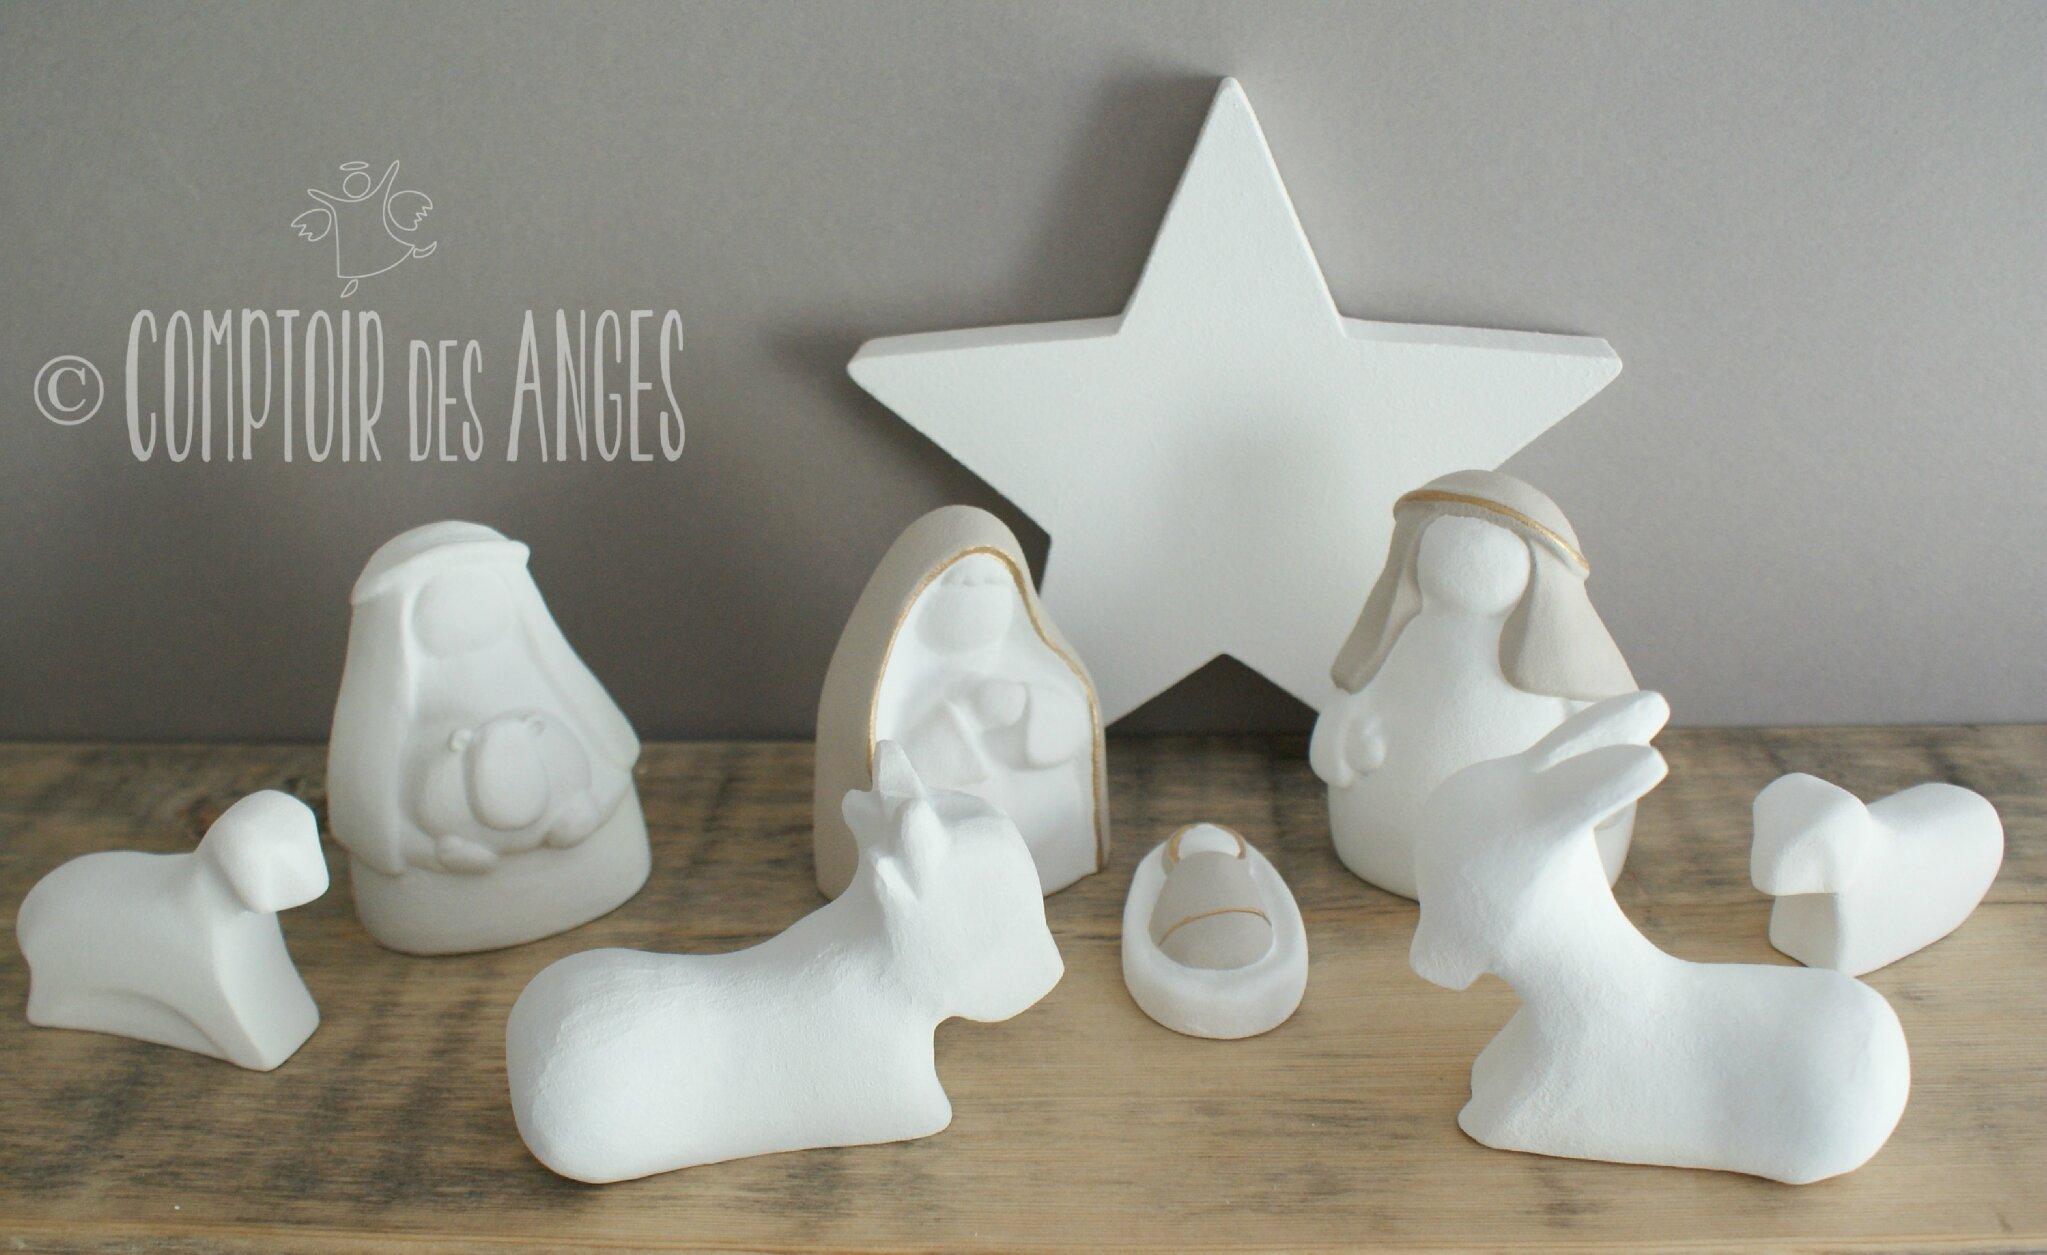 nouvelle cr che 2015 comptoir des anges. Black Bedroom Furniture Sets. Home Design Ideas